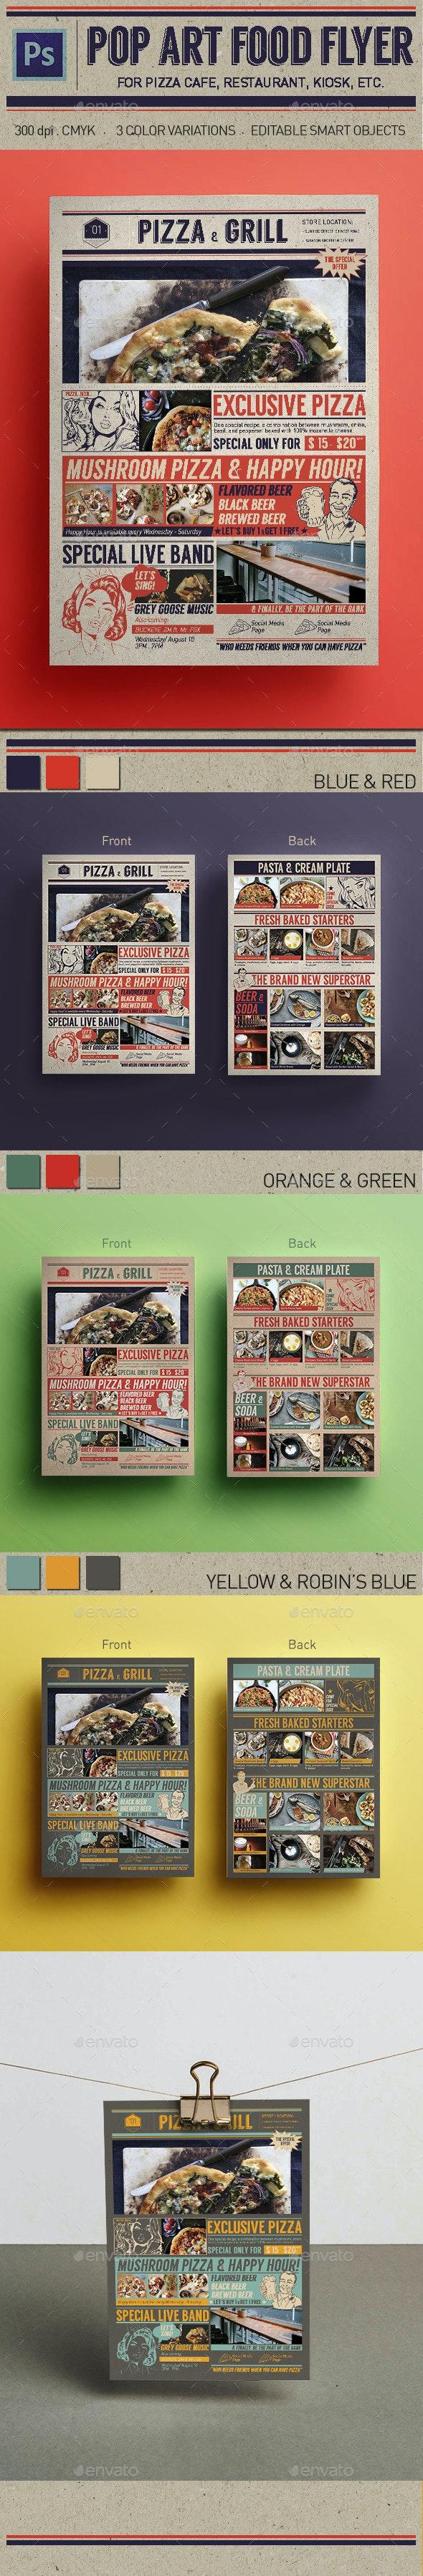 Pop Art Pizza Flyer - Food Menus Print Templates